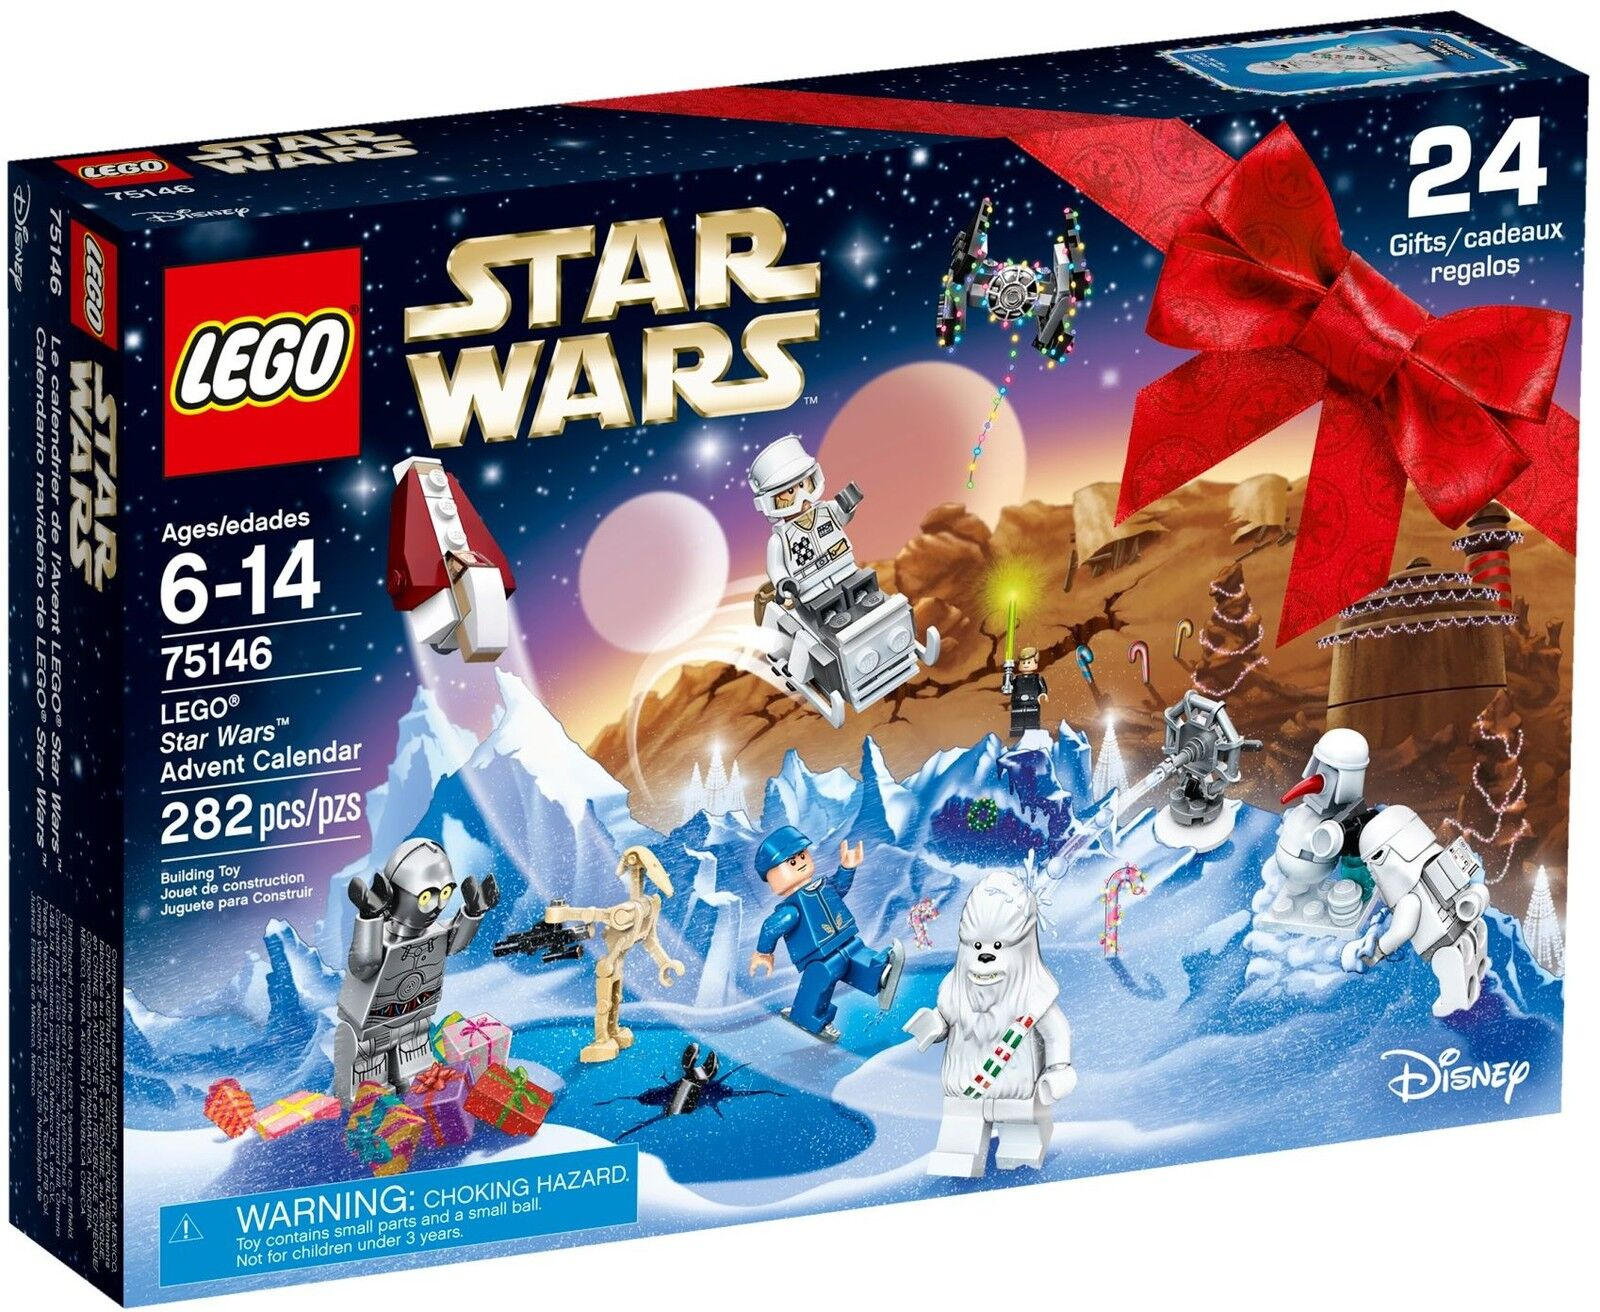 LEGO ® Star Wars ™ 75146 LEGO ® Star Wars ™ Advent Calendario NUOVO OVP NEW MISB NRFB